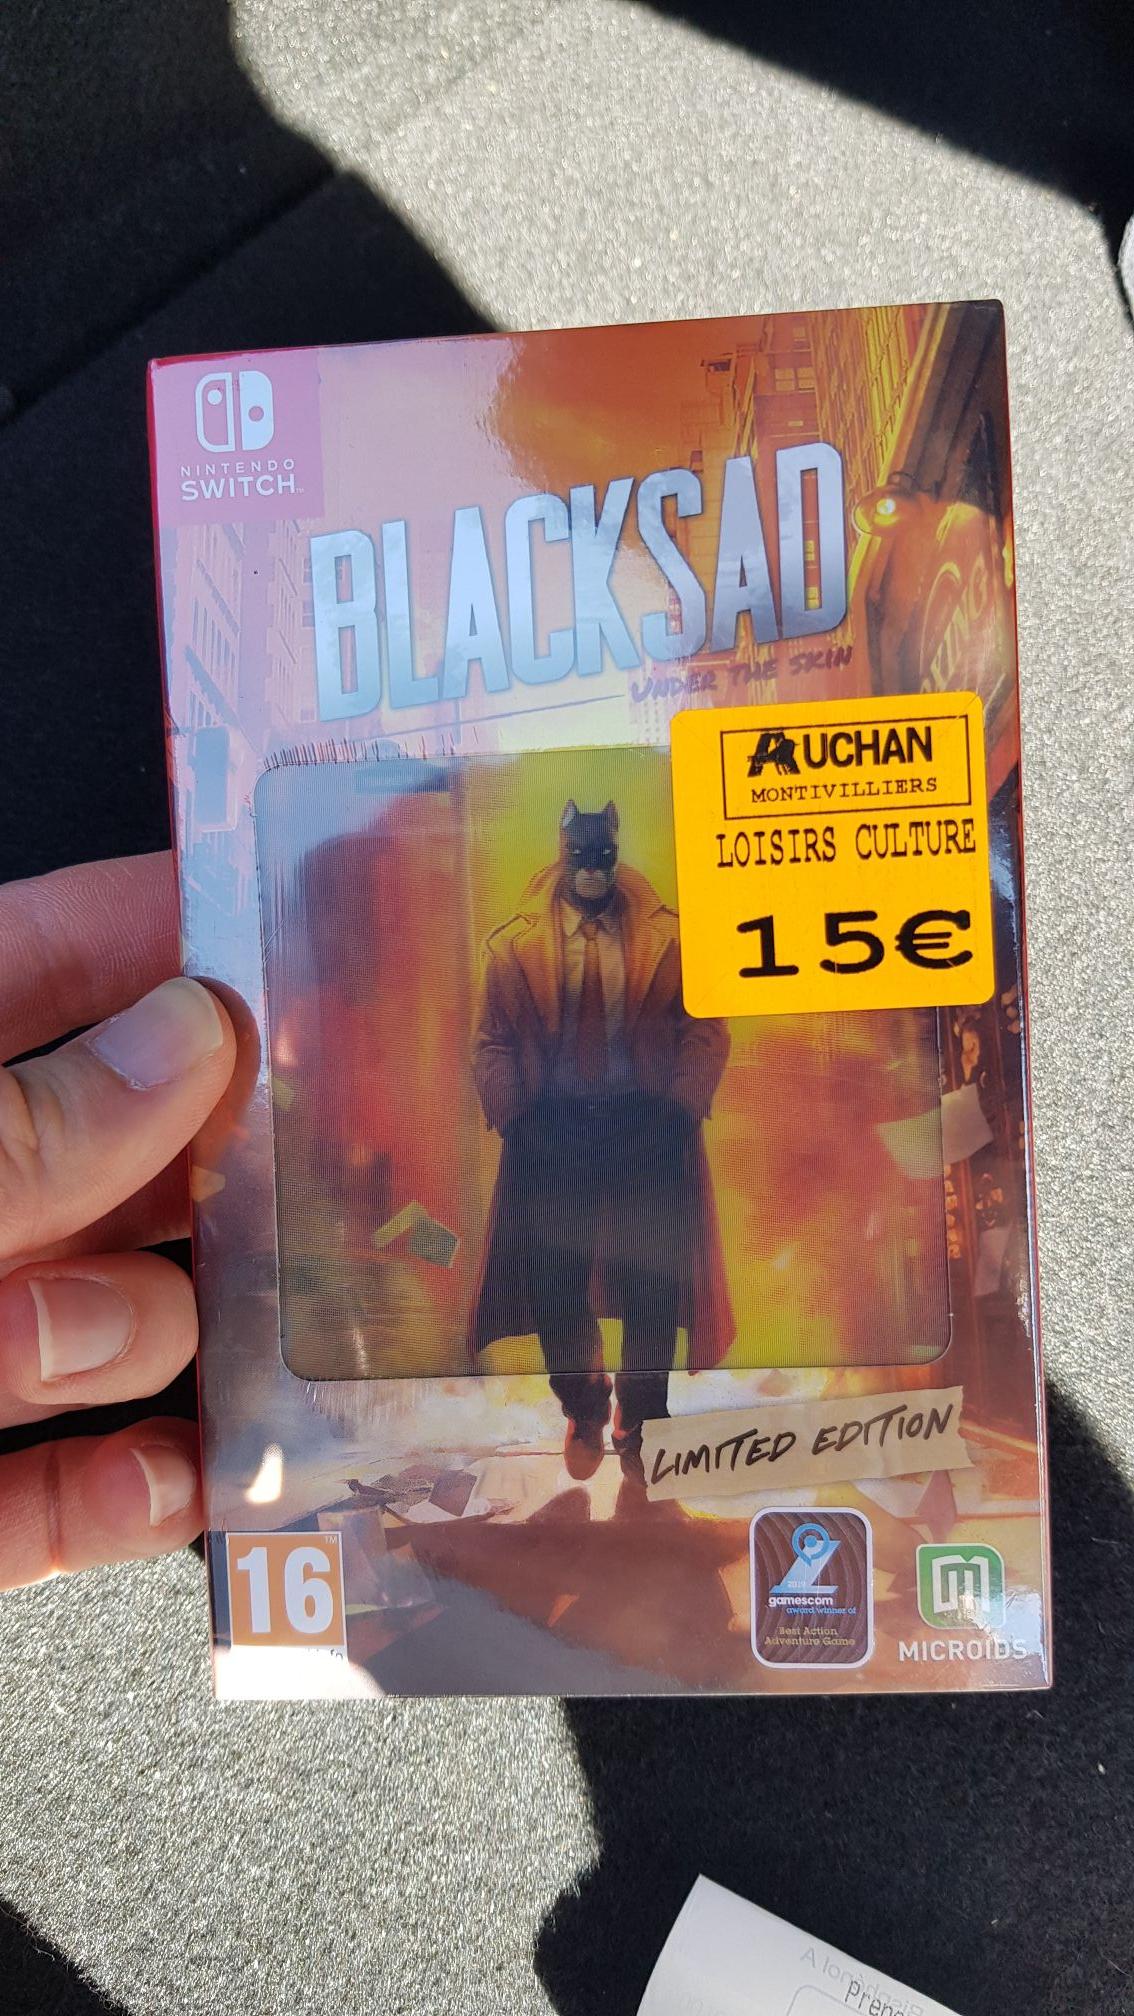 Blacksad sur Nintendo Switch - Montivilliers (76)